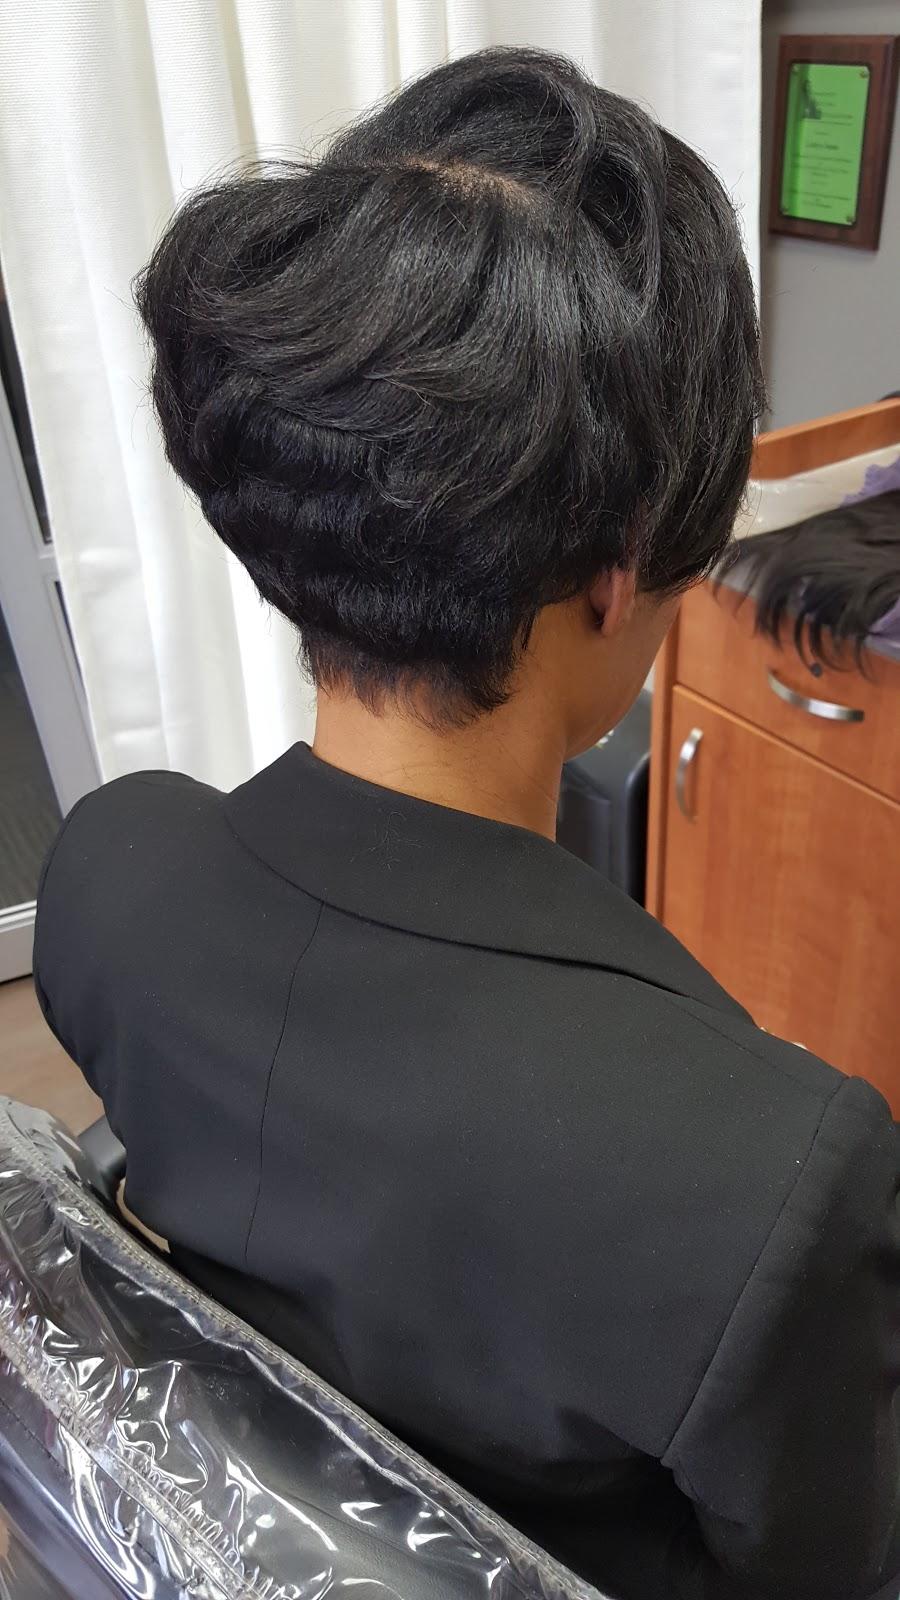 How To Maintain Your Short Hairstyle Latoya Jones